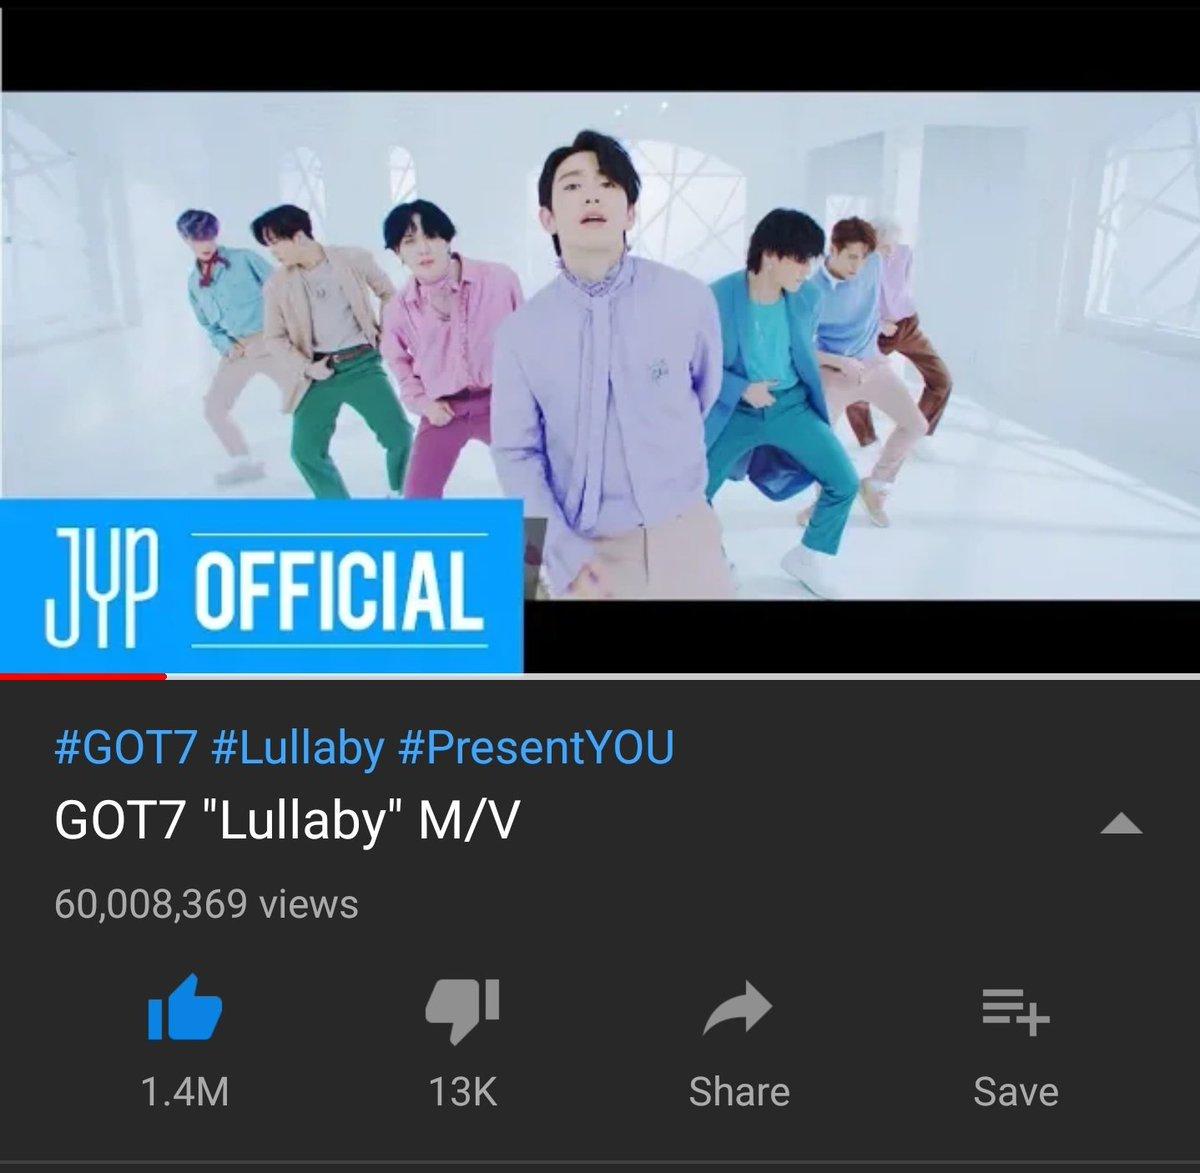 lullaby finally 60M   #Lullaby  #GOT7  #PresentYOU  #갓세븐  #Present_YOUandME  @GOT7Official<br>http://pic.twitter.com/5nTX5u4zWB